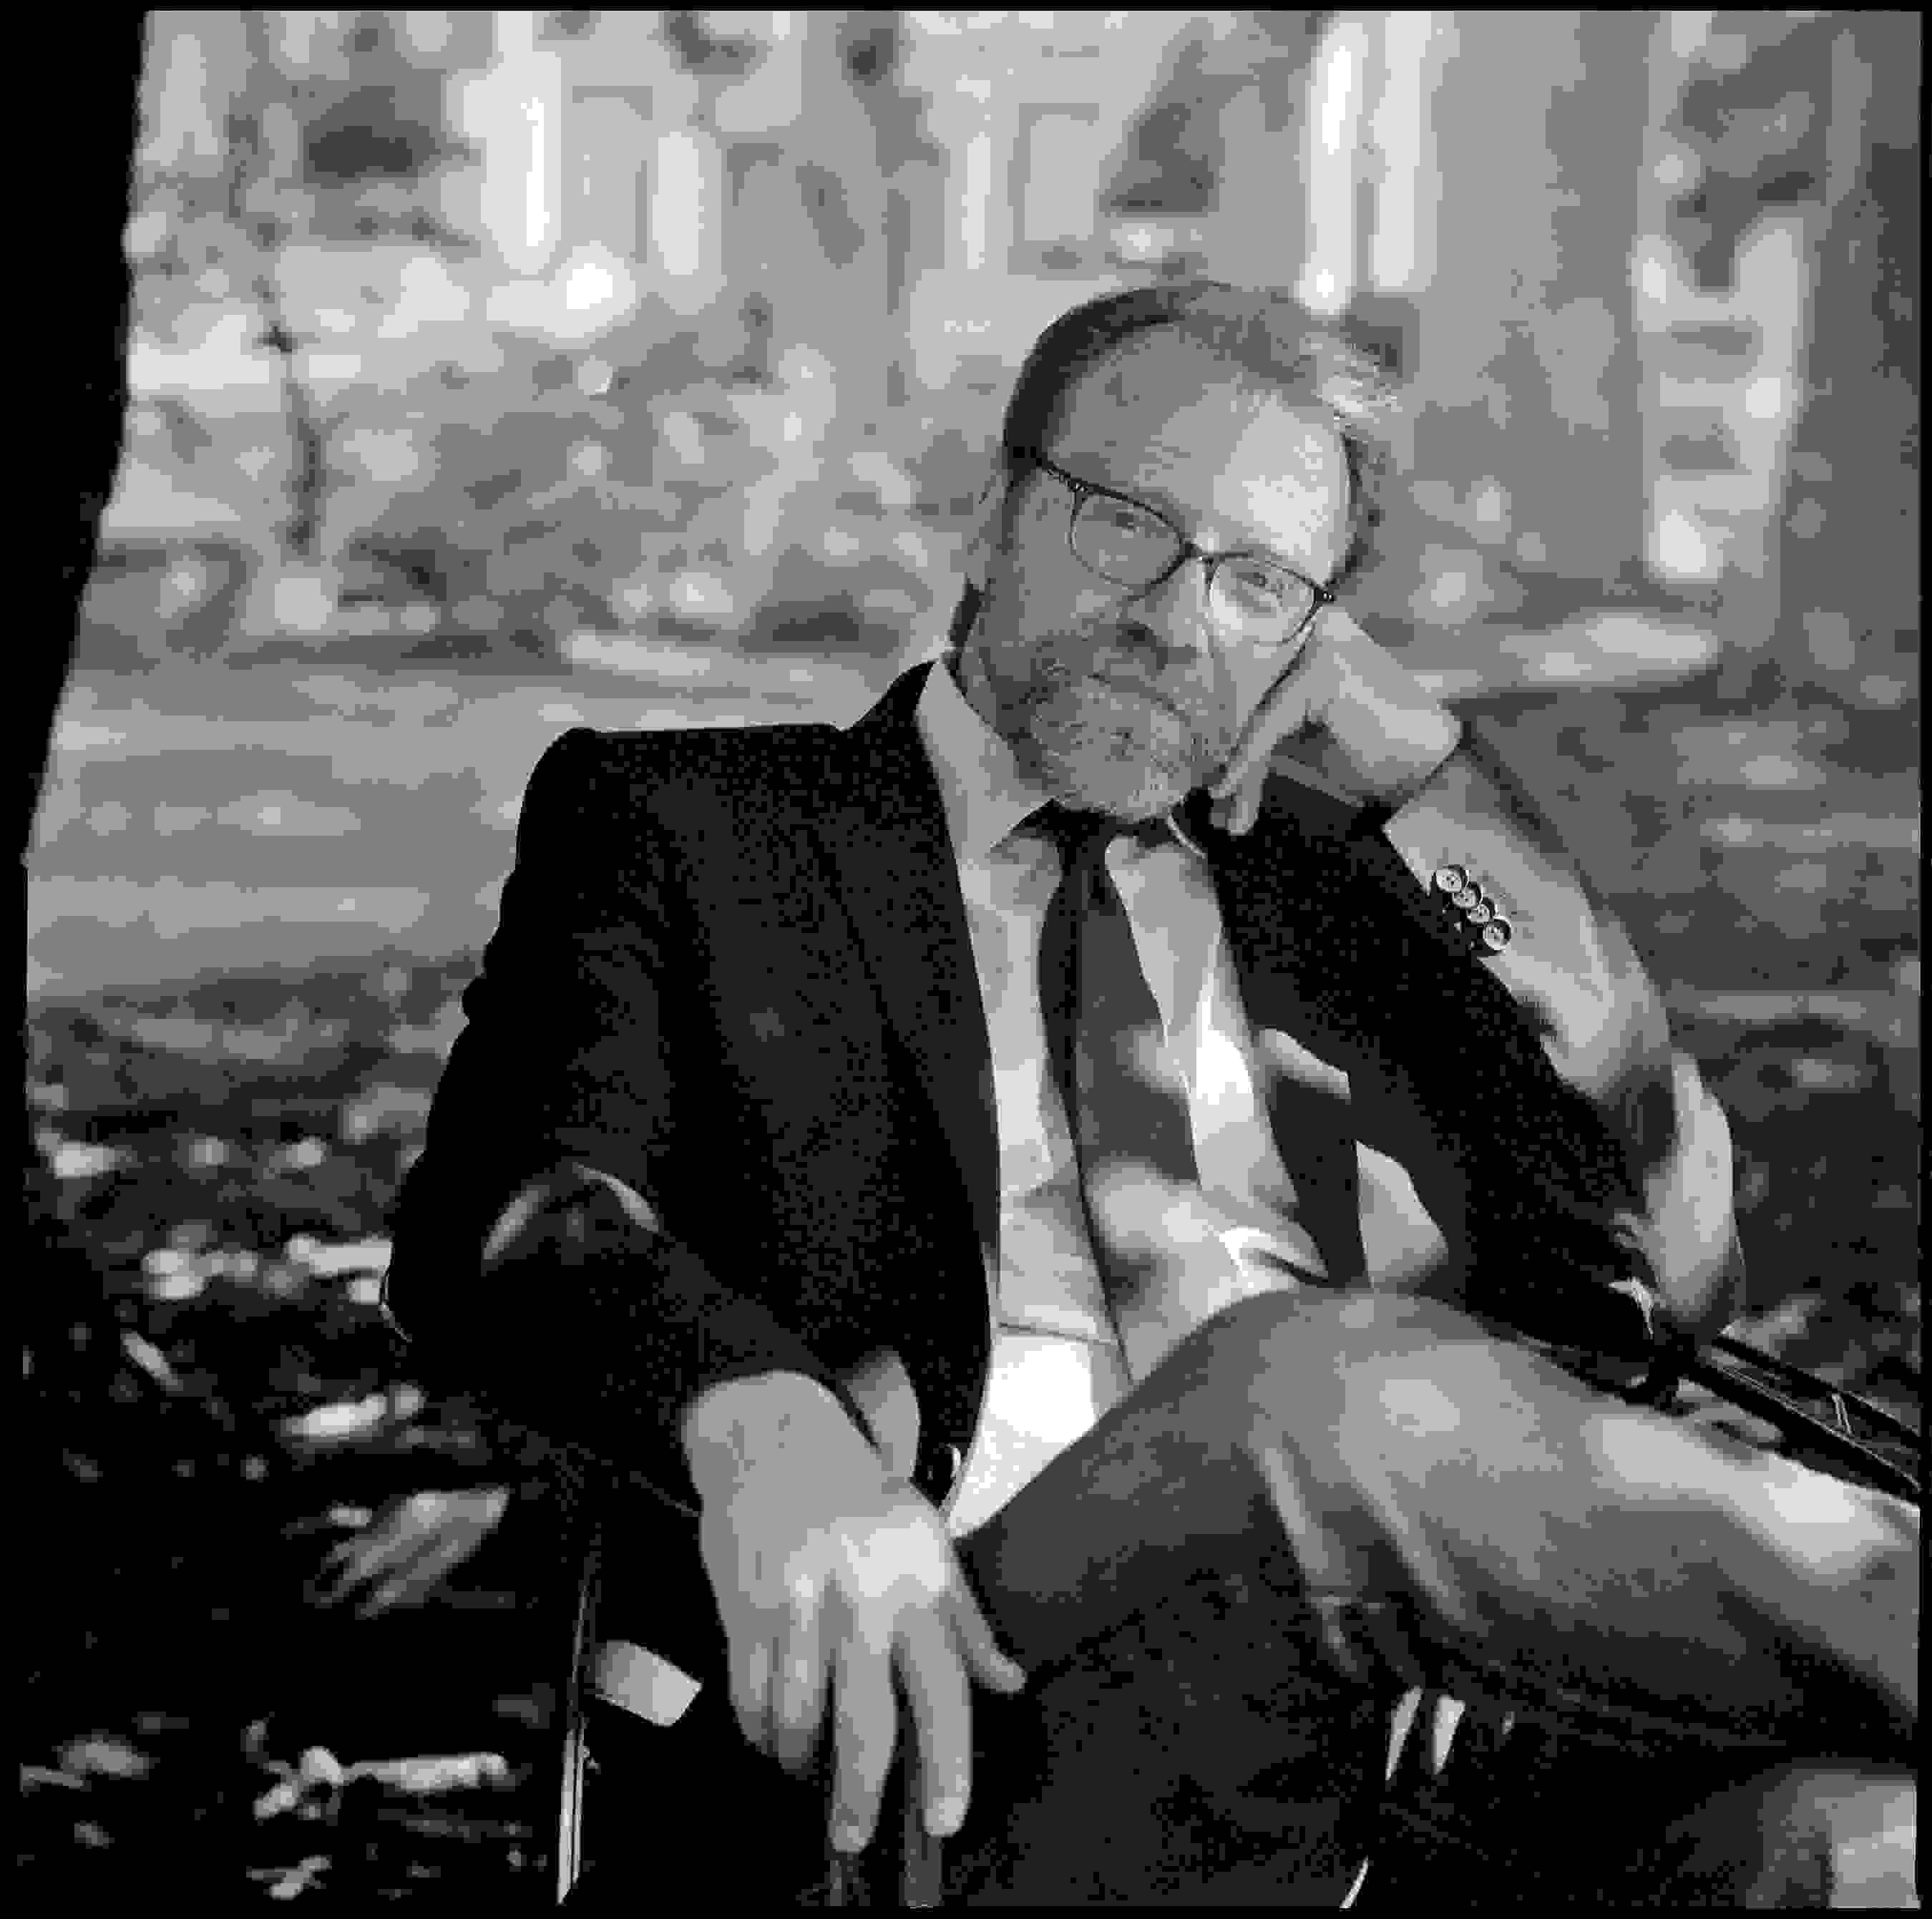 George Saunders in Conversation with Paul Holdengräber